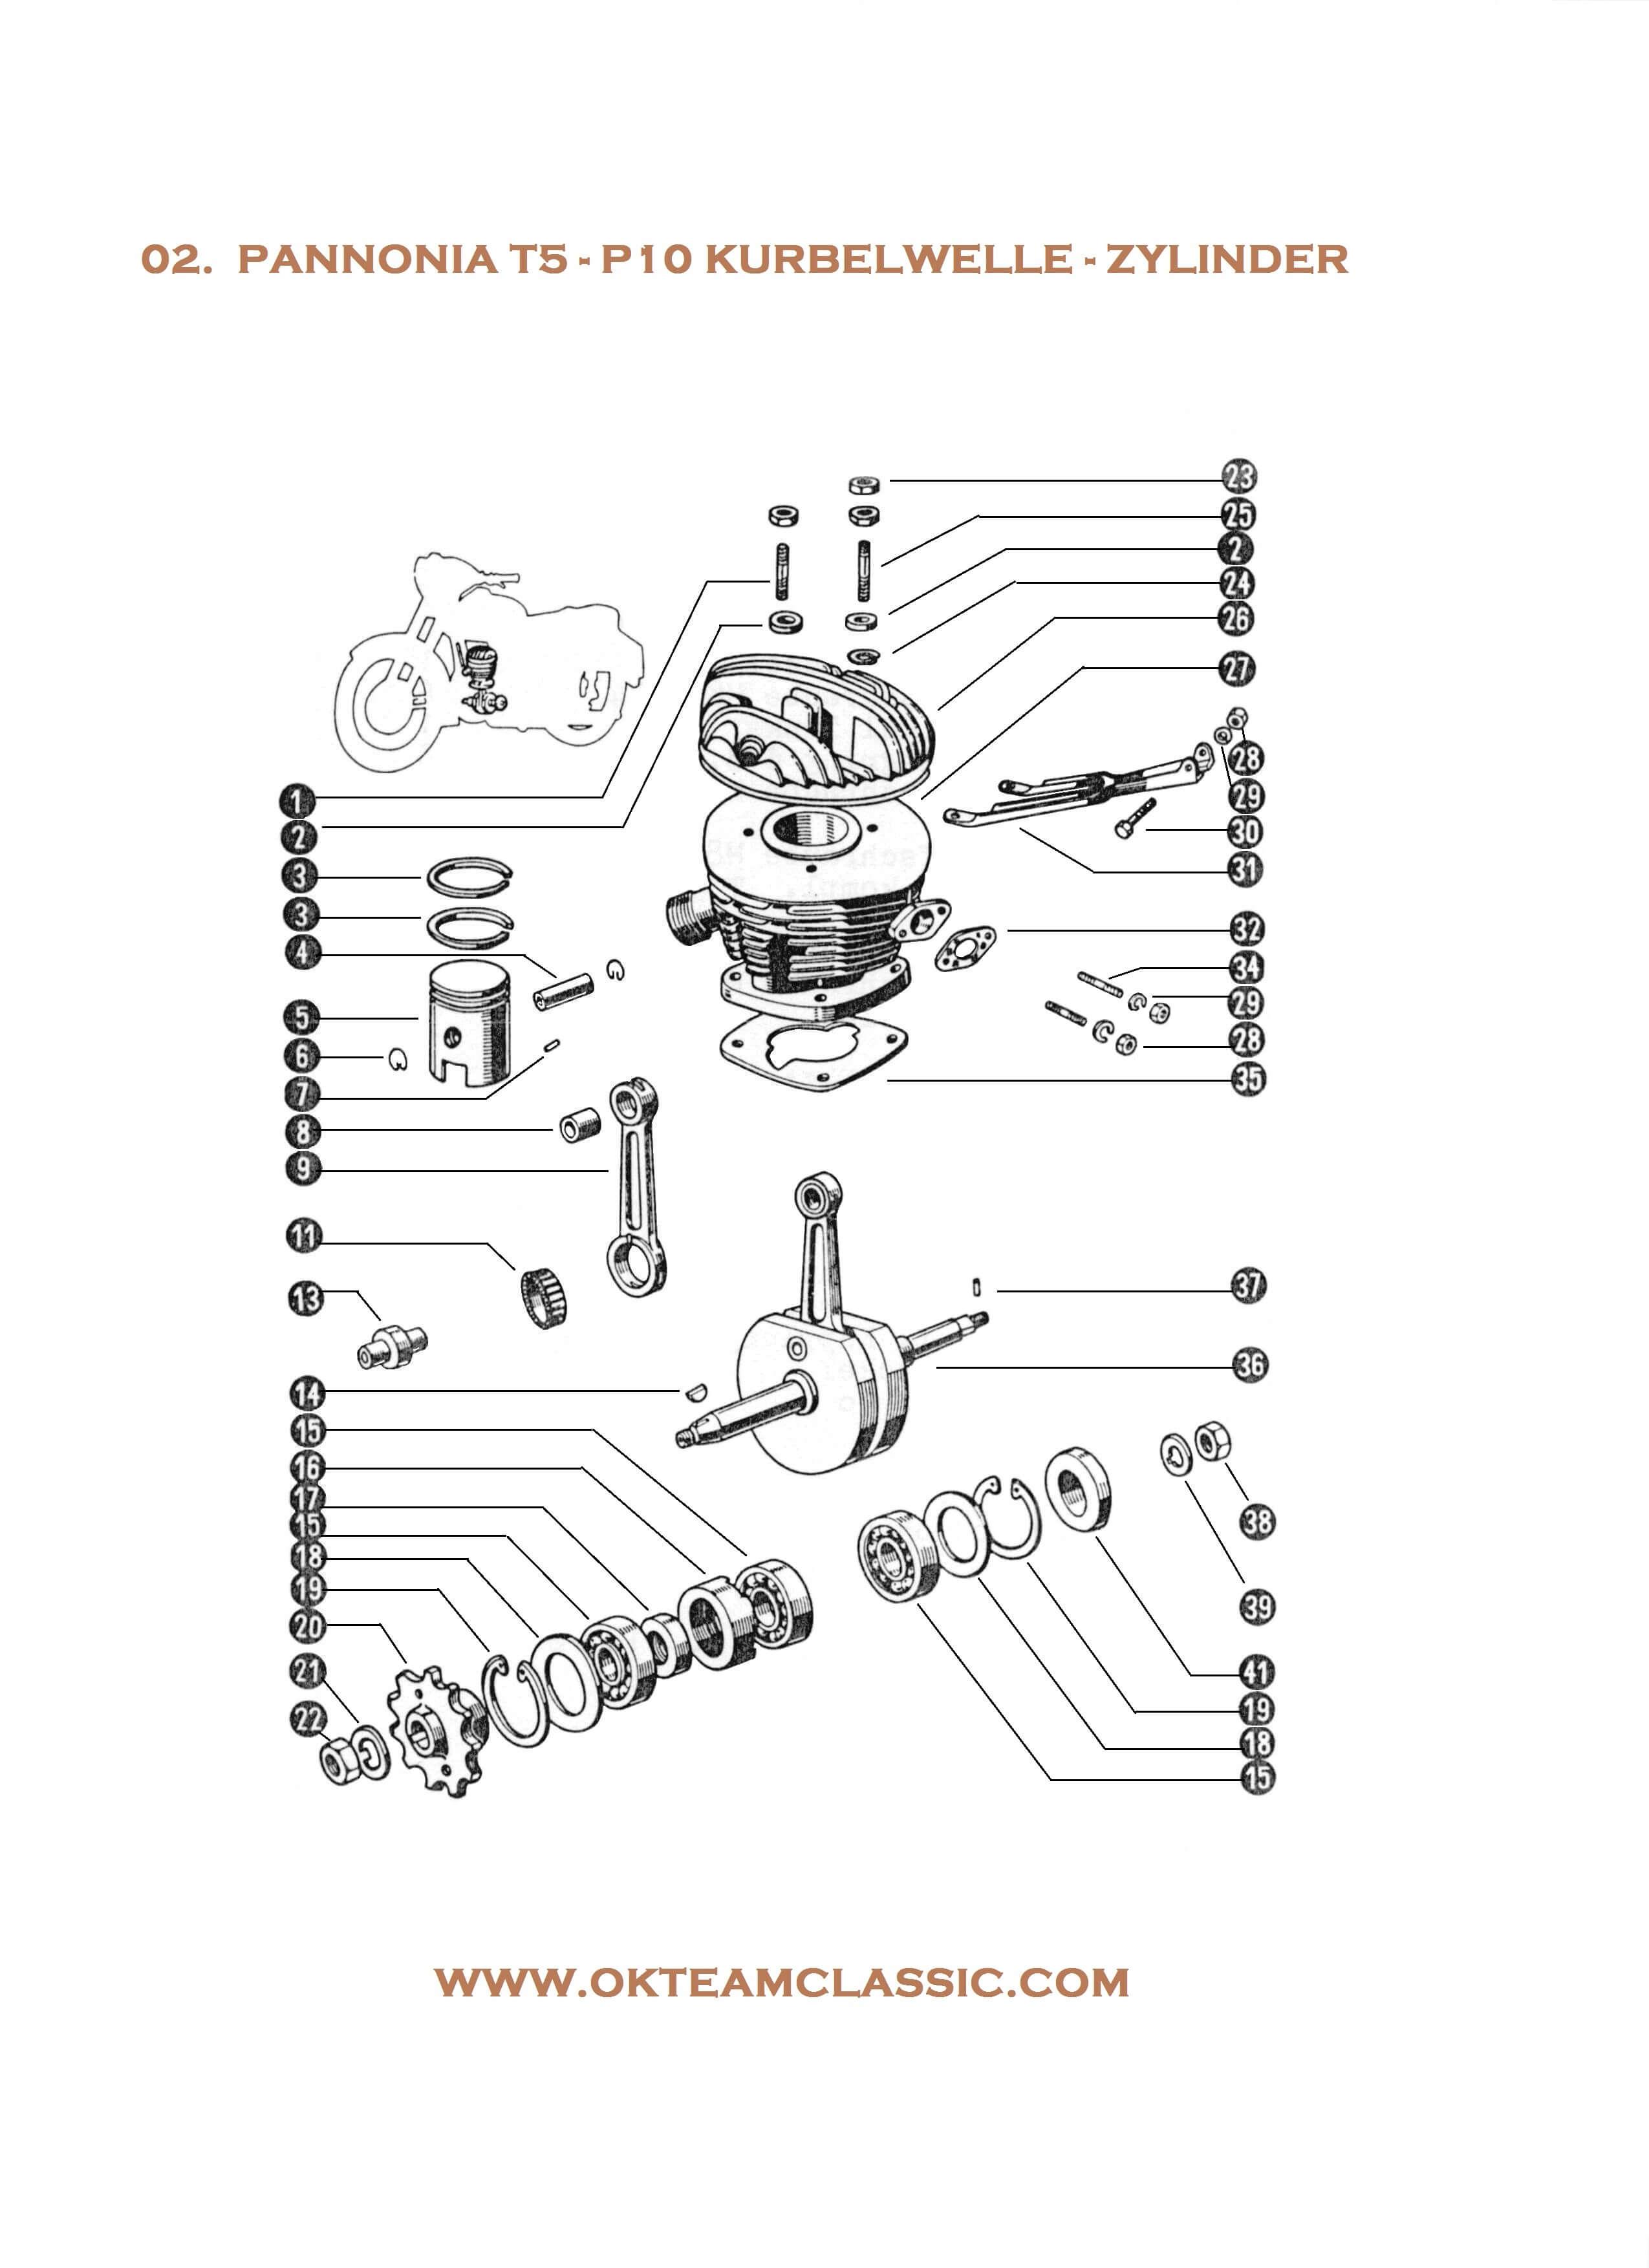 02. Crankshaft- Cylinder